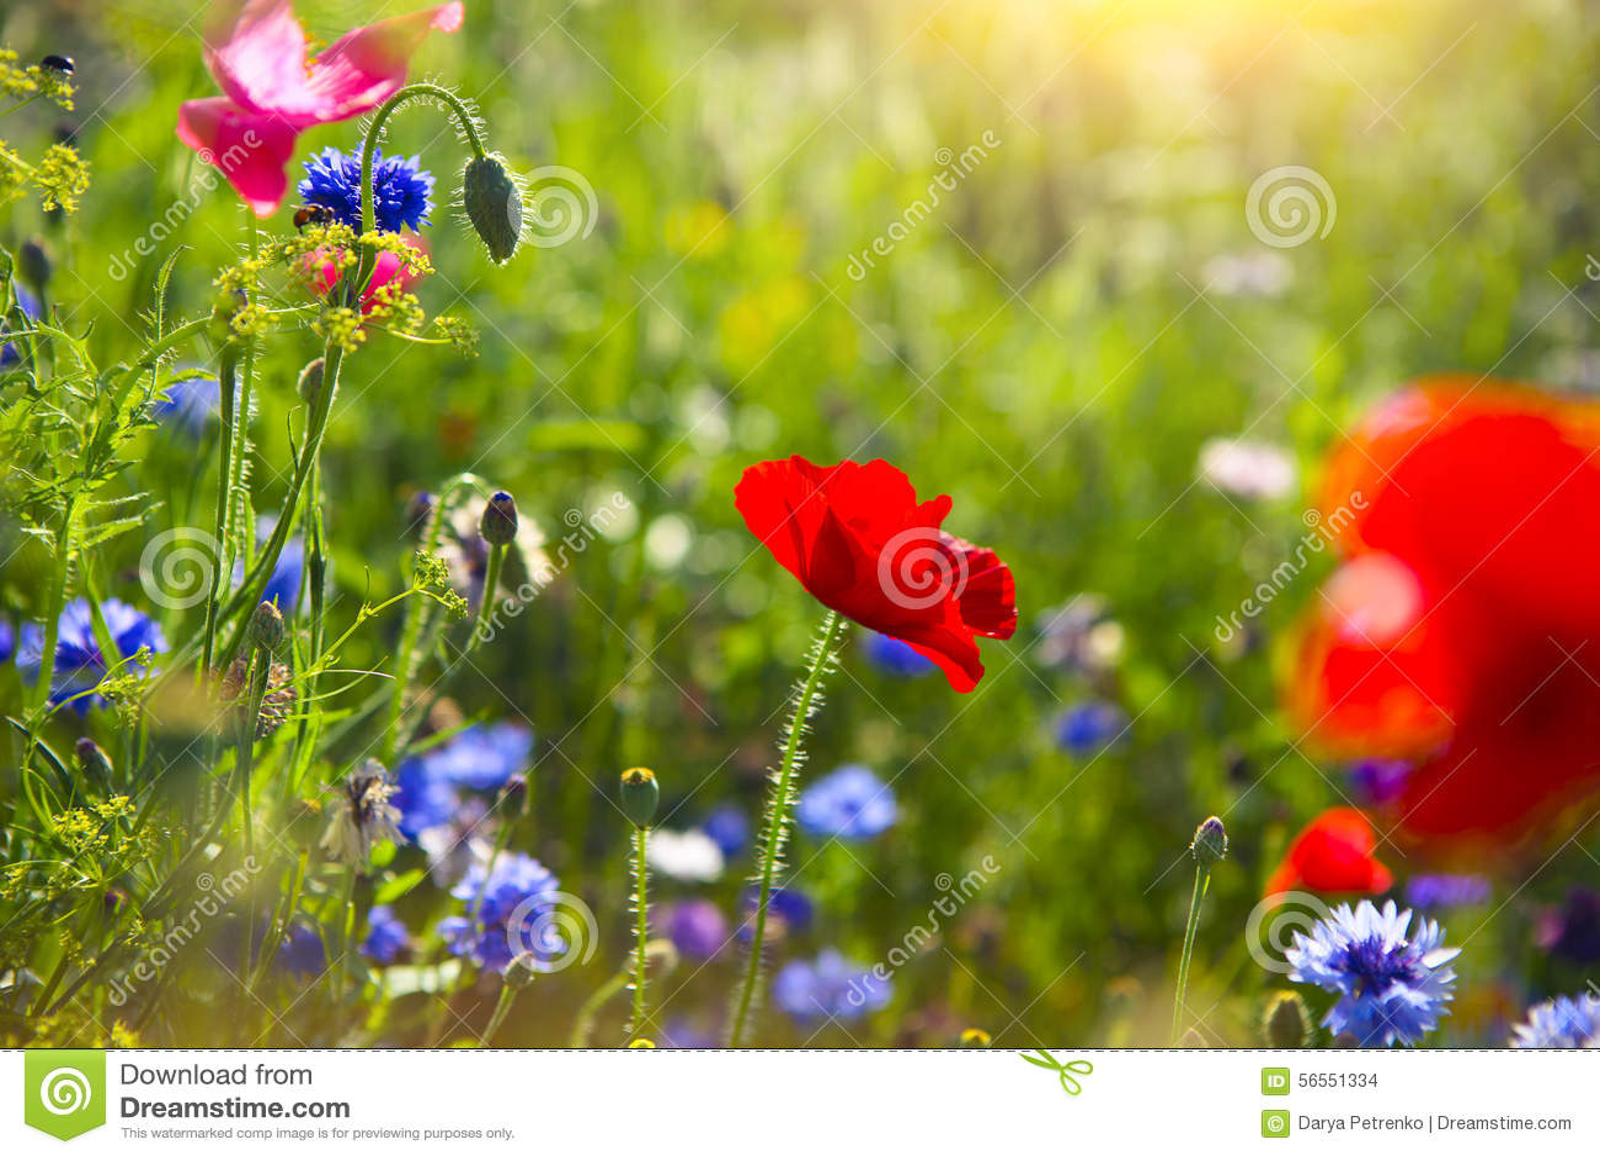 Download Θερινό τοπίο με έναν τομέα των κόκκινων παπαρουνών και Cornflower Στοκ Εικόνες - εικόνα από έξυπνο, άνοιξη: 56551334